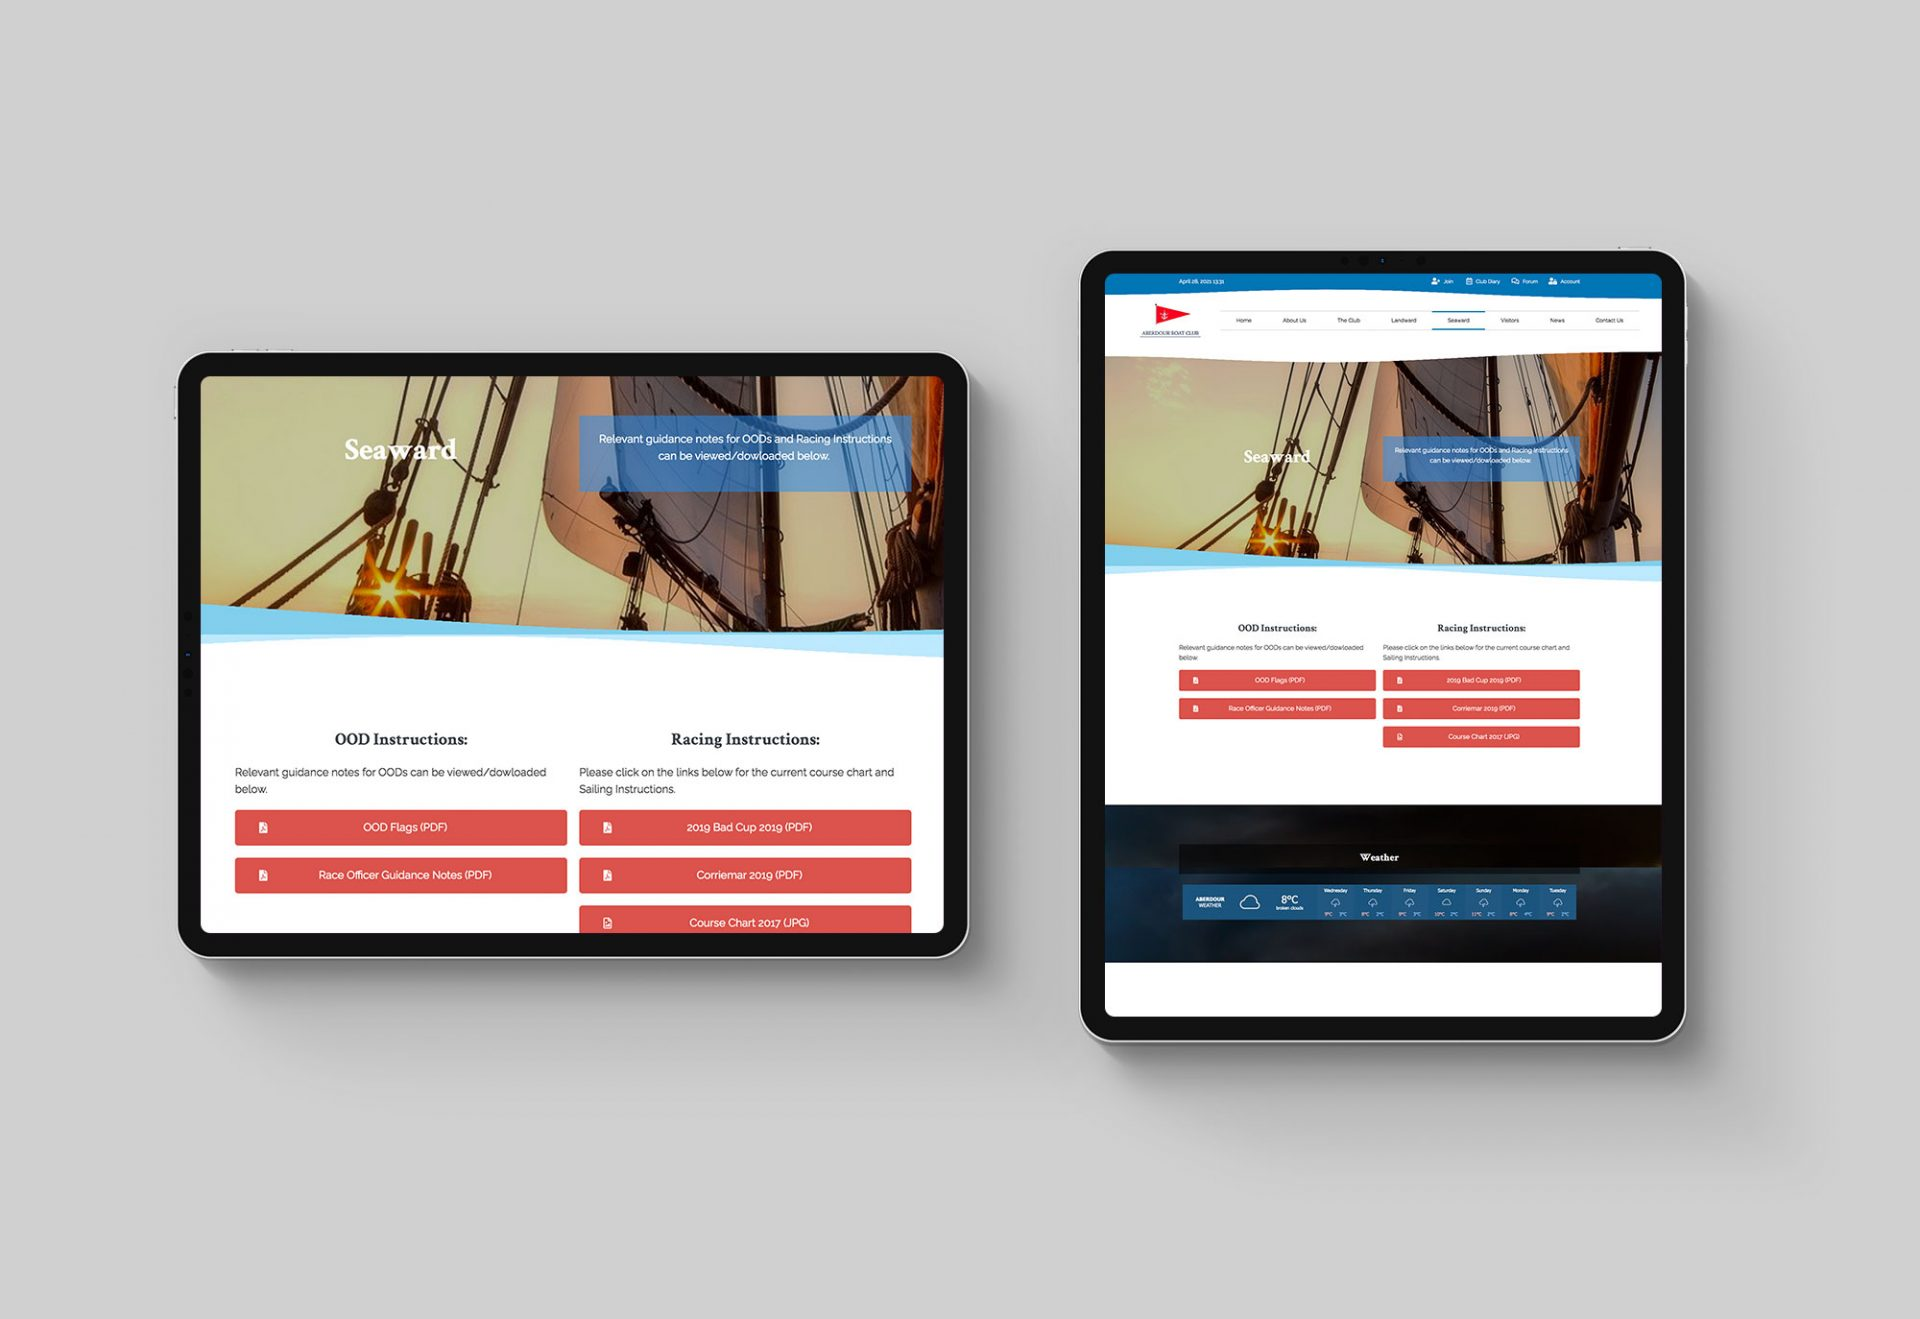 Aberdour Boat Club - Website screenshots